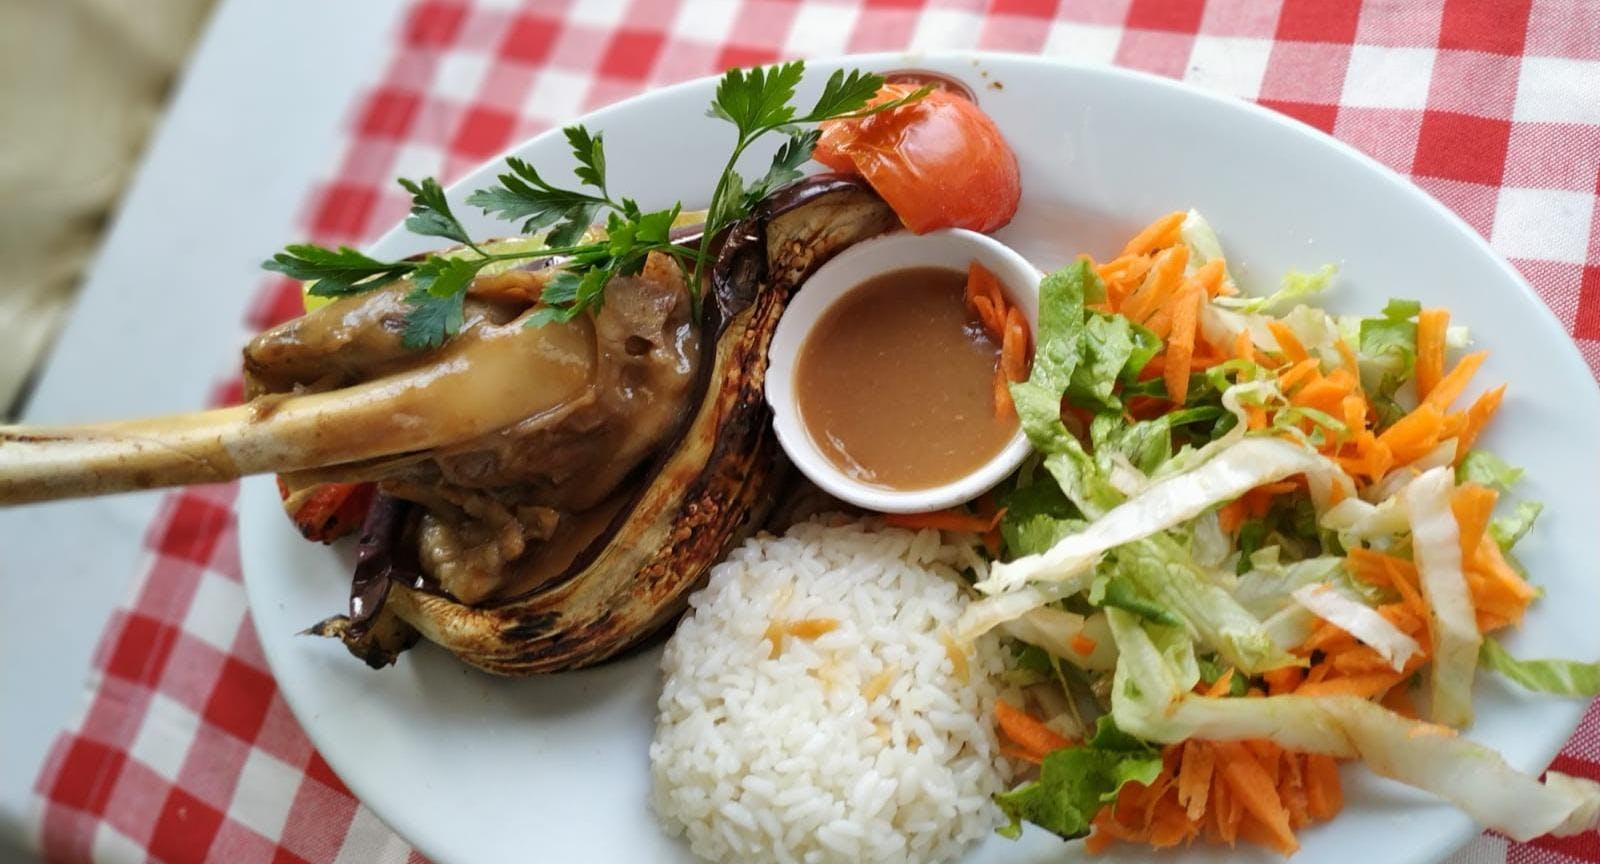 Myterrace Cafe & Restaurant